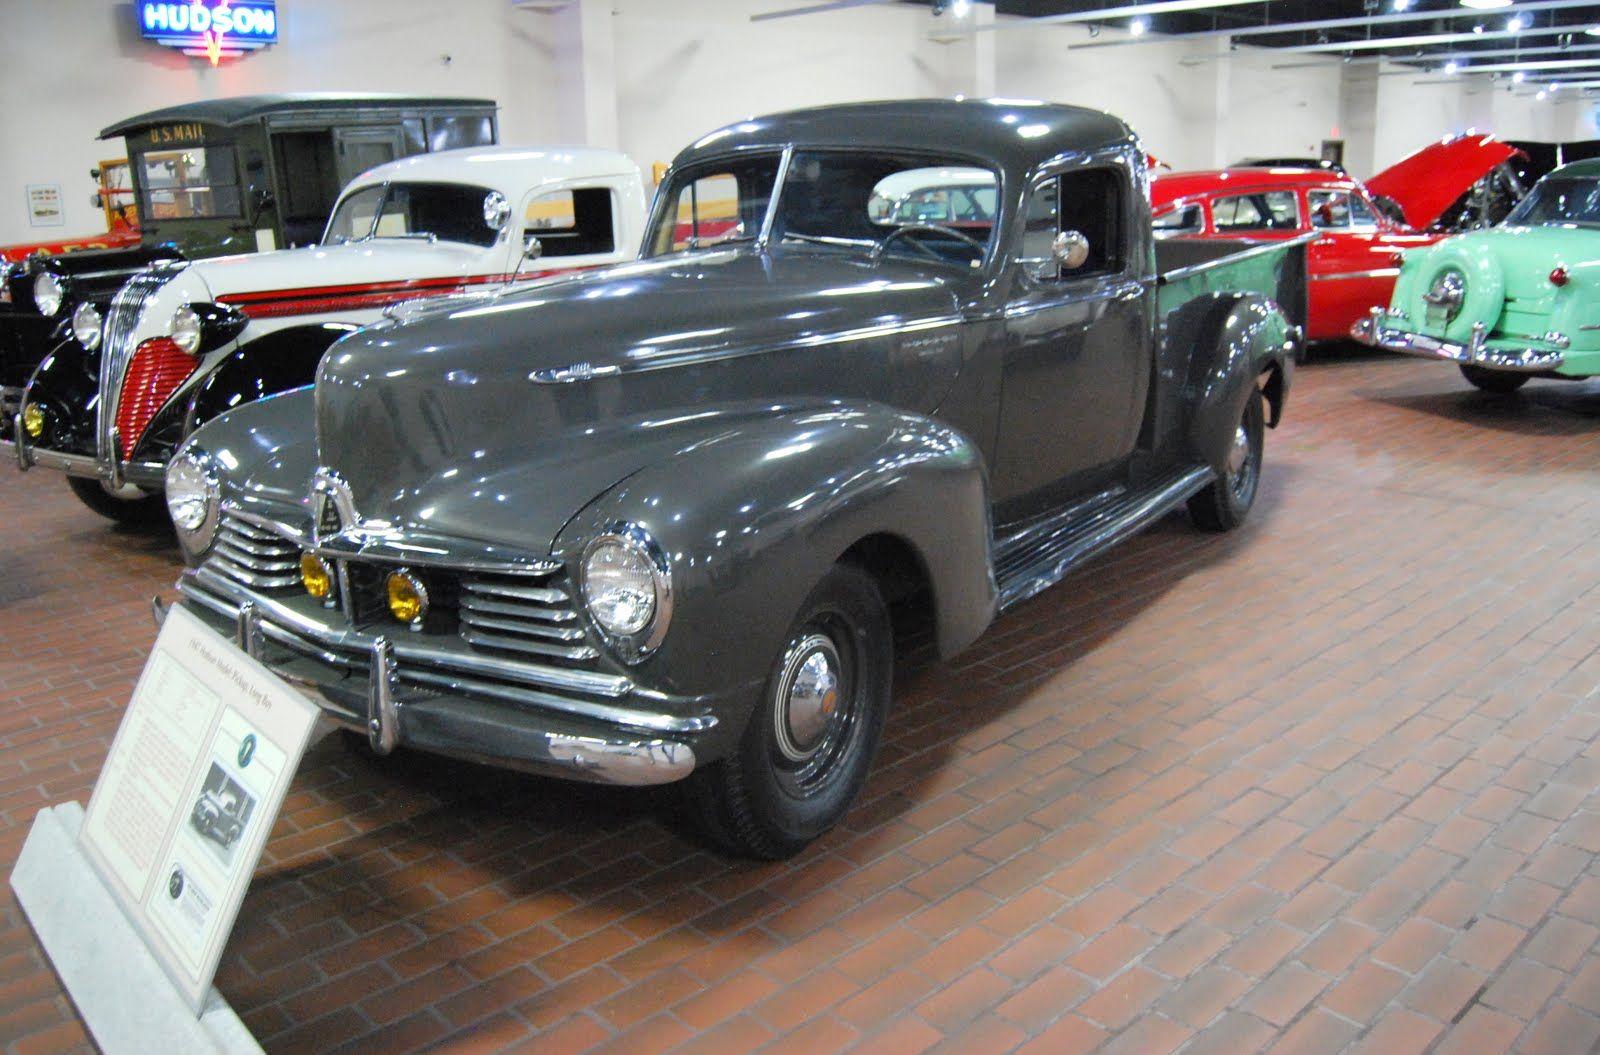 1947 Hudson Long Boy pickup   Classic Marques - Hudson   Pinterest ...